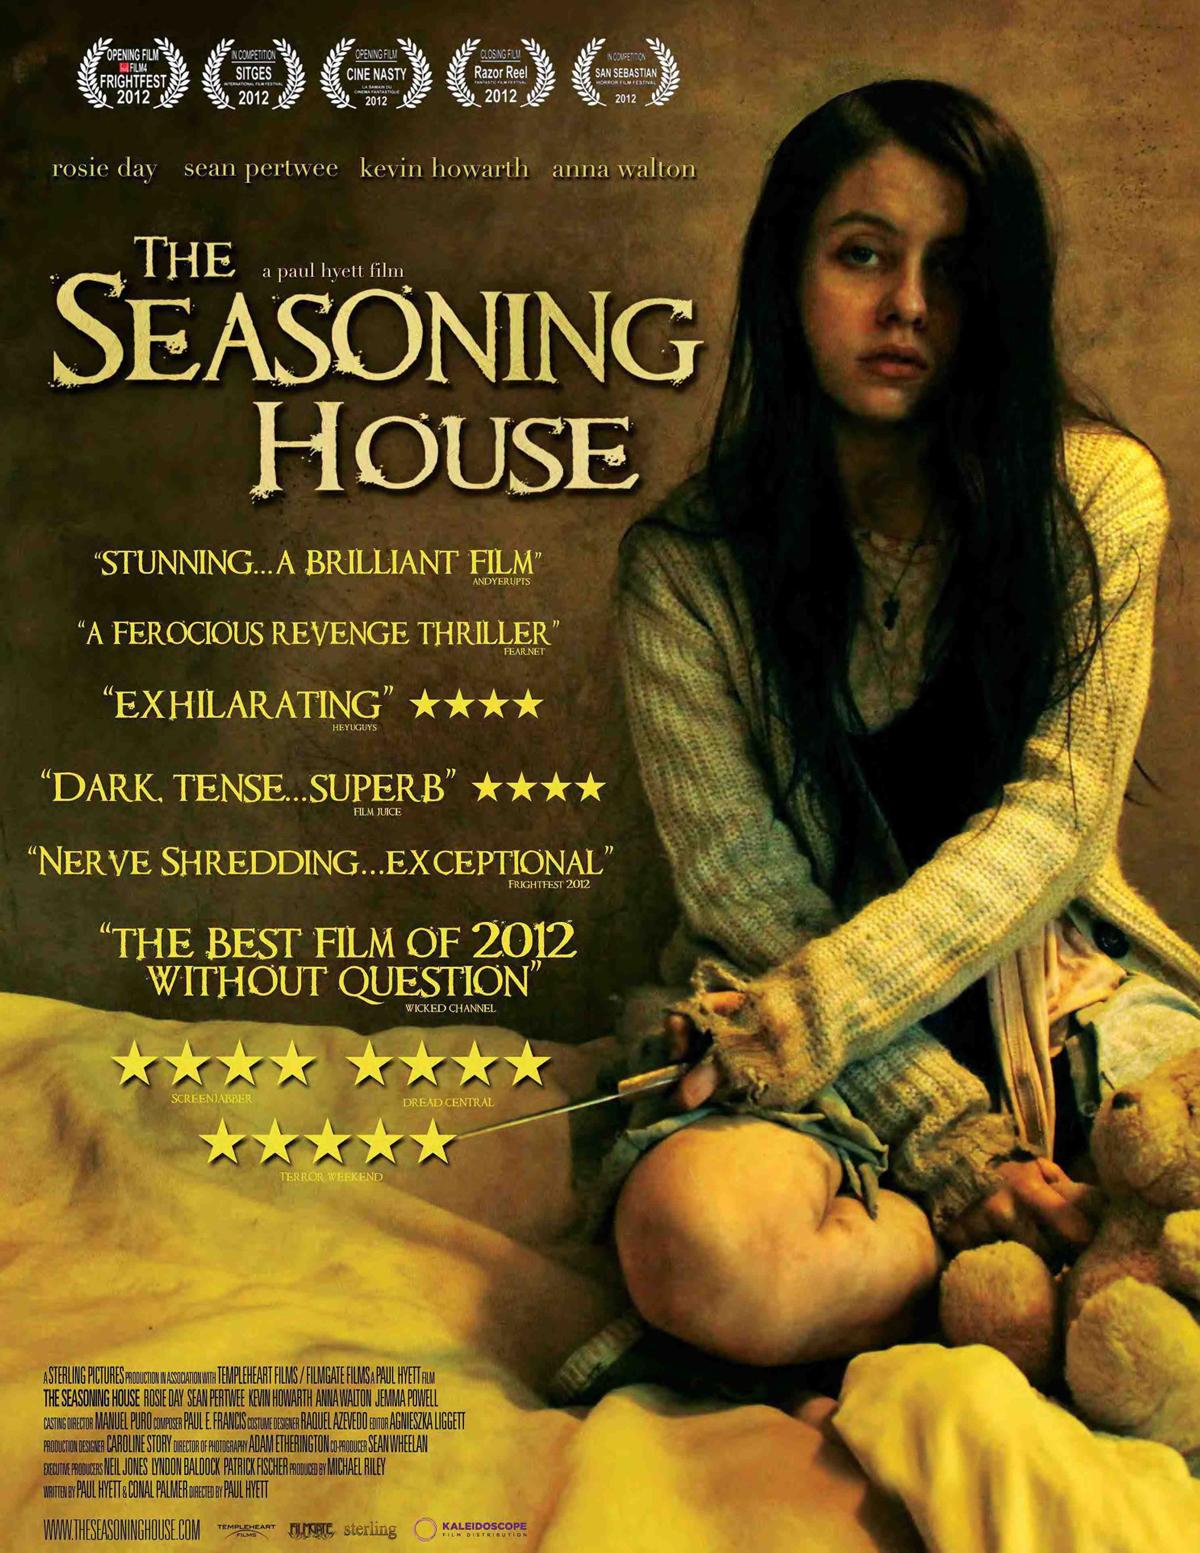 the-Seasoning_House-poster2.jpg